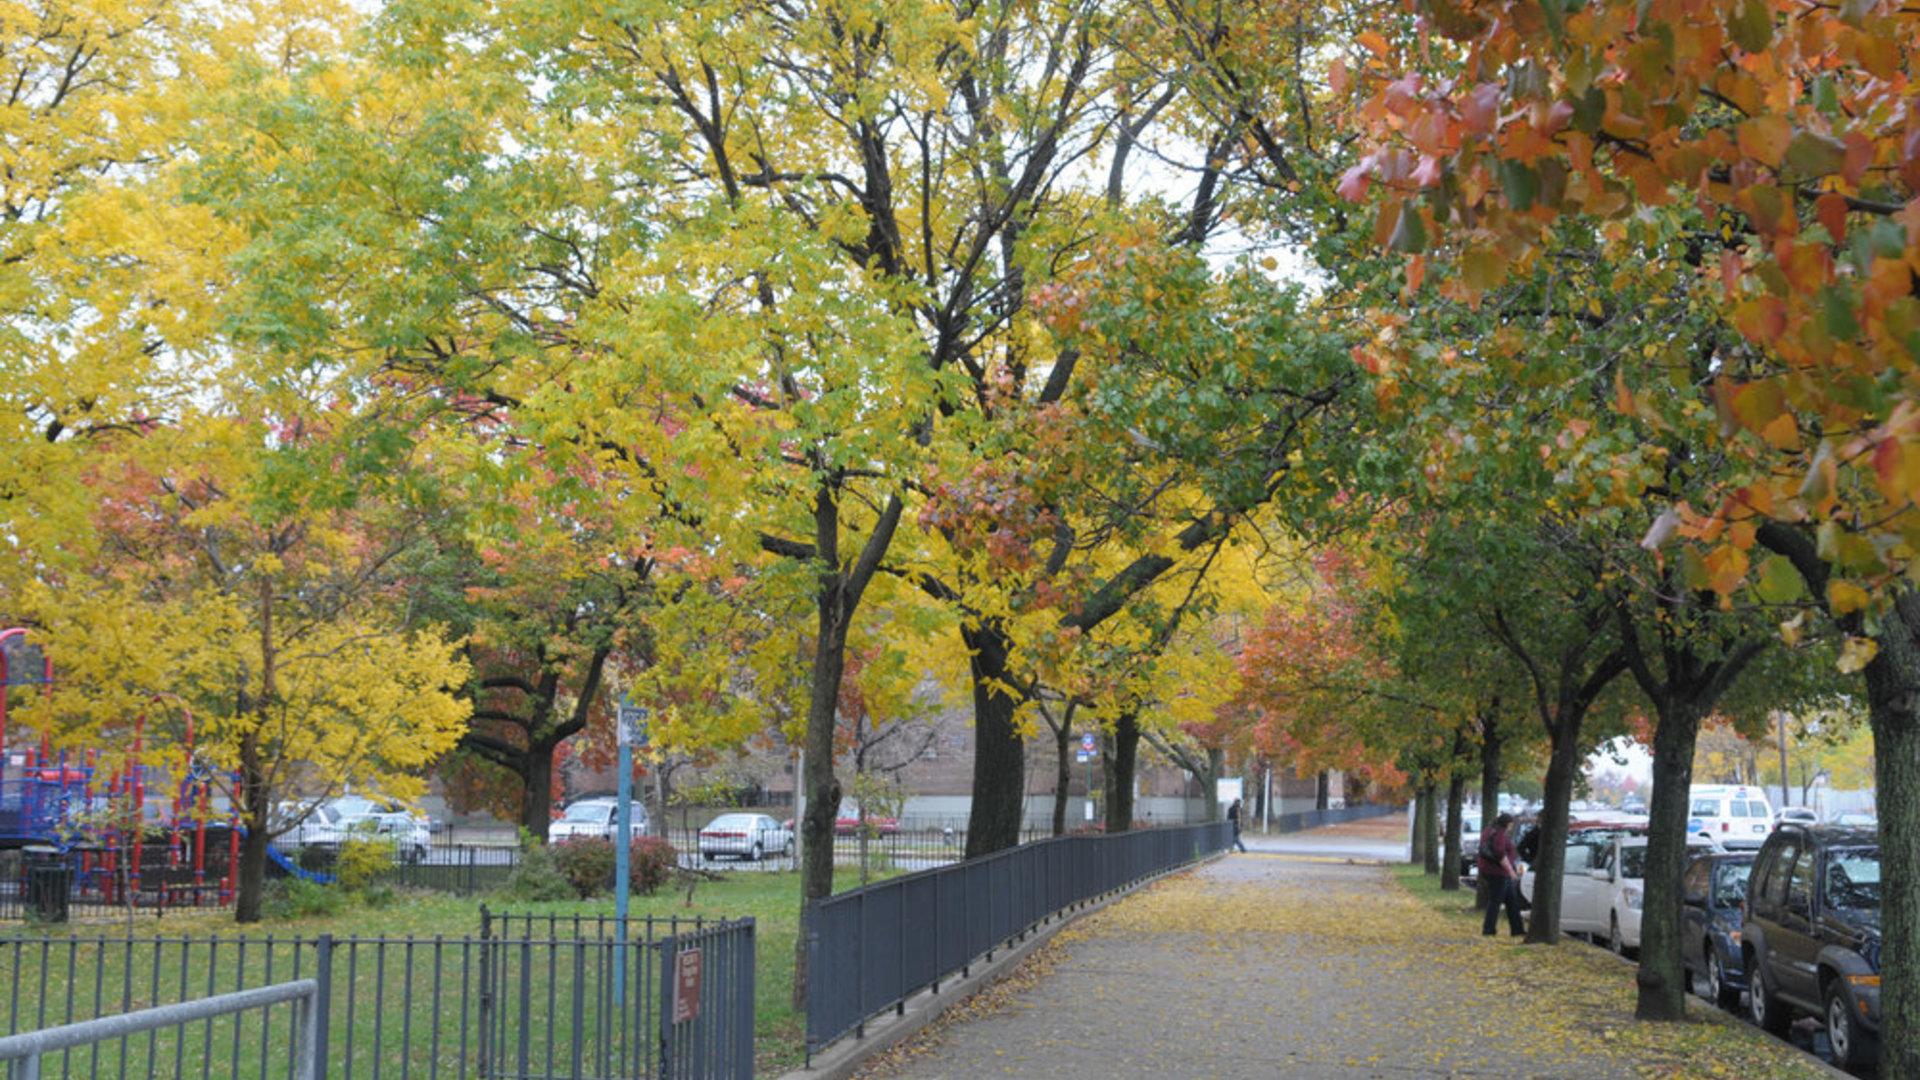 Da3 9642 11 06 08 street trees